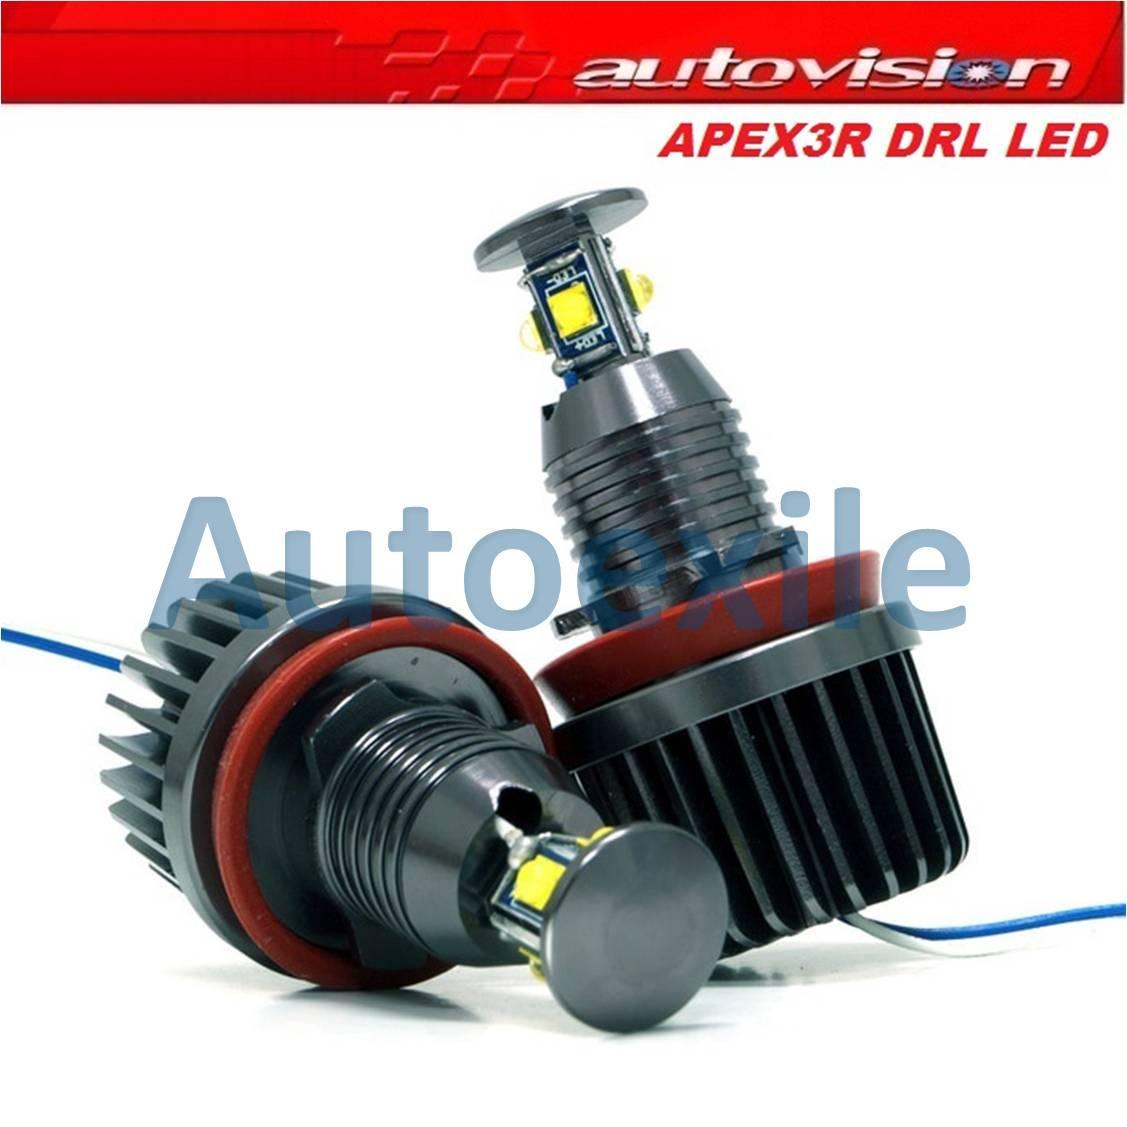 Autovision Apex3r DRL LED H8 40W 6000K Putih Lampu Mobil BMW E60 E61 E63 E64 E70 E71 E82 E89 E90 E91 E92 E93 X1 X5 X6 Z4